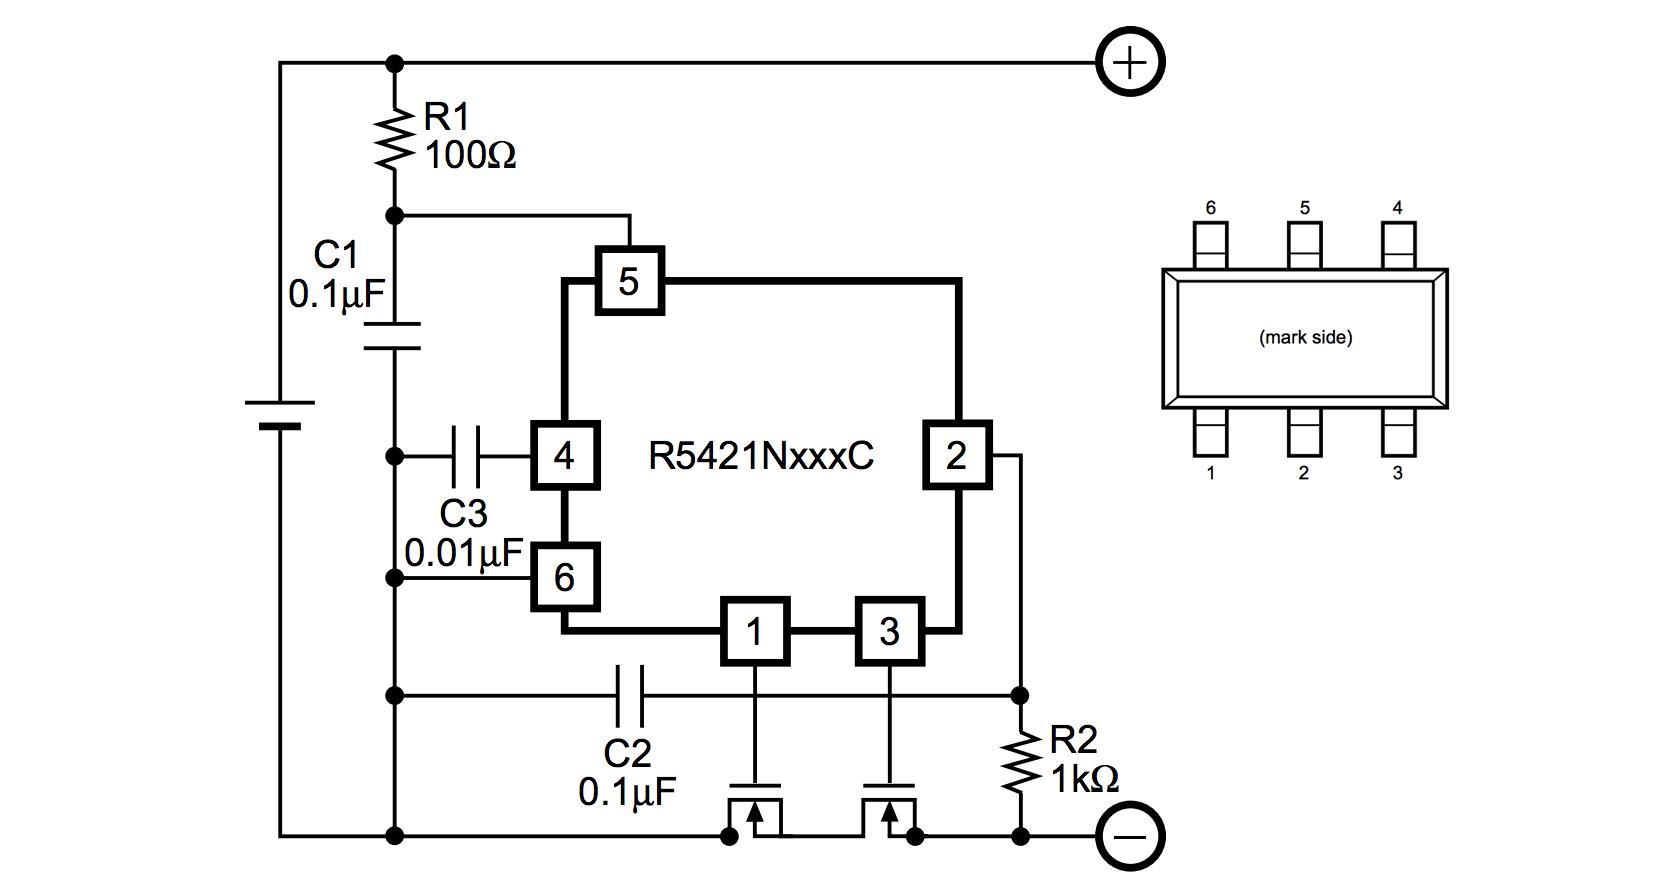 Схема защиты литиевого аккумулятора на микросхемах серии R5421N